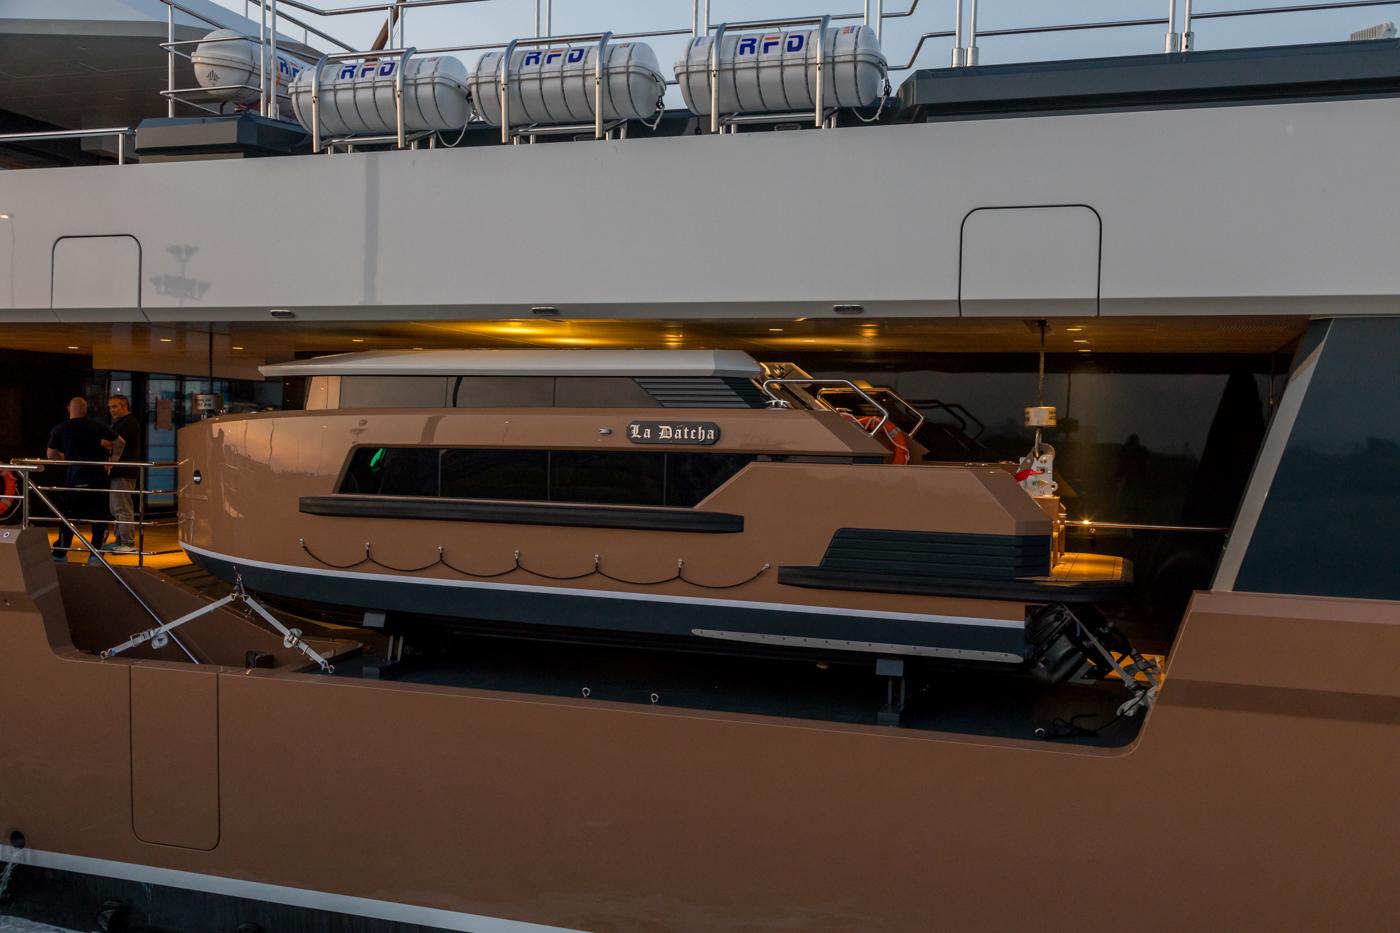 Yacht-La-Datcha-77-Heliski-Russia-7